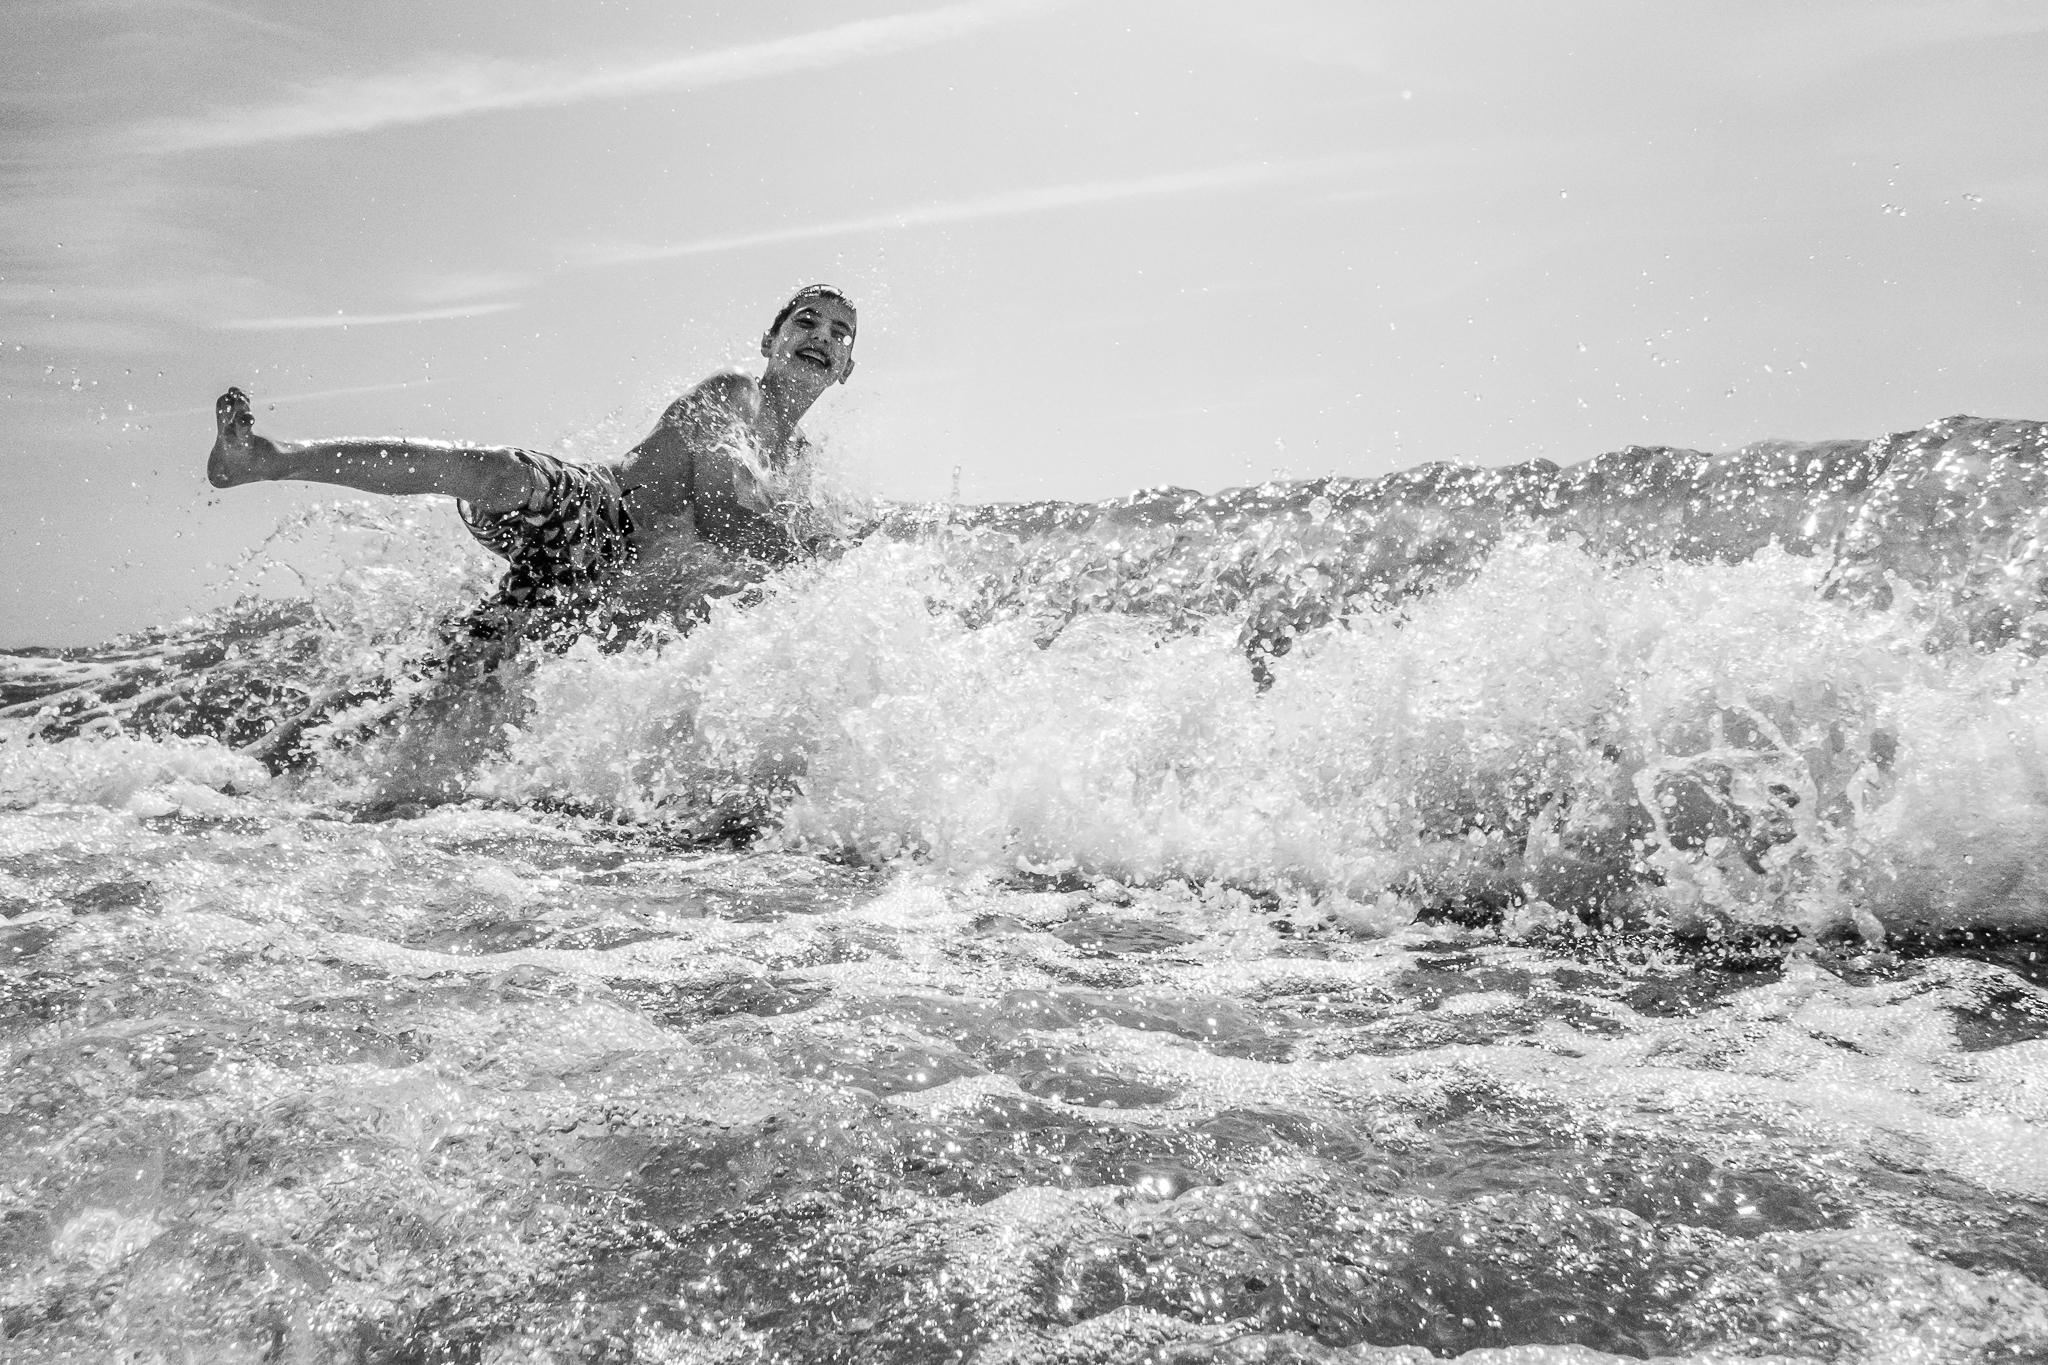 New Jersey Beach Photographer, Boy Jumping In Ocean Wave